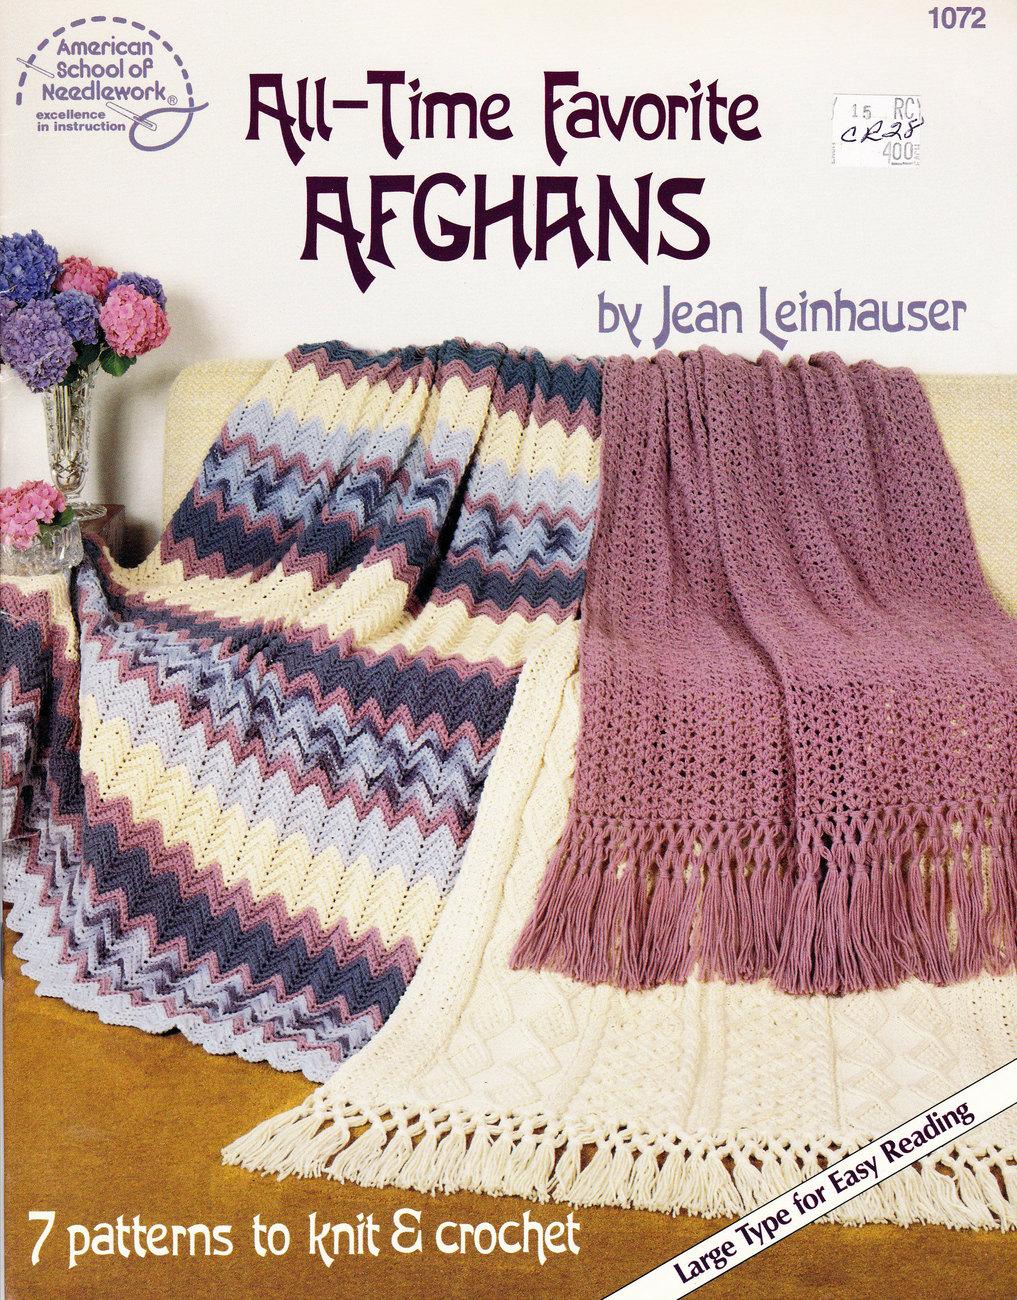 CROCHET ALL-TIME FAVORITE AFGHANS BY JEAN LEINHAUSER - $4.95